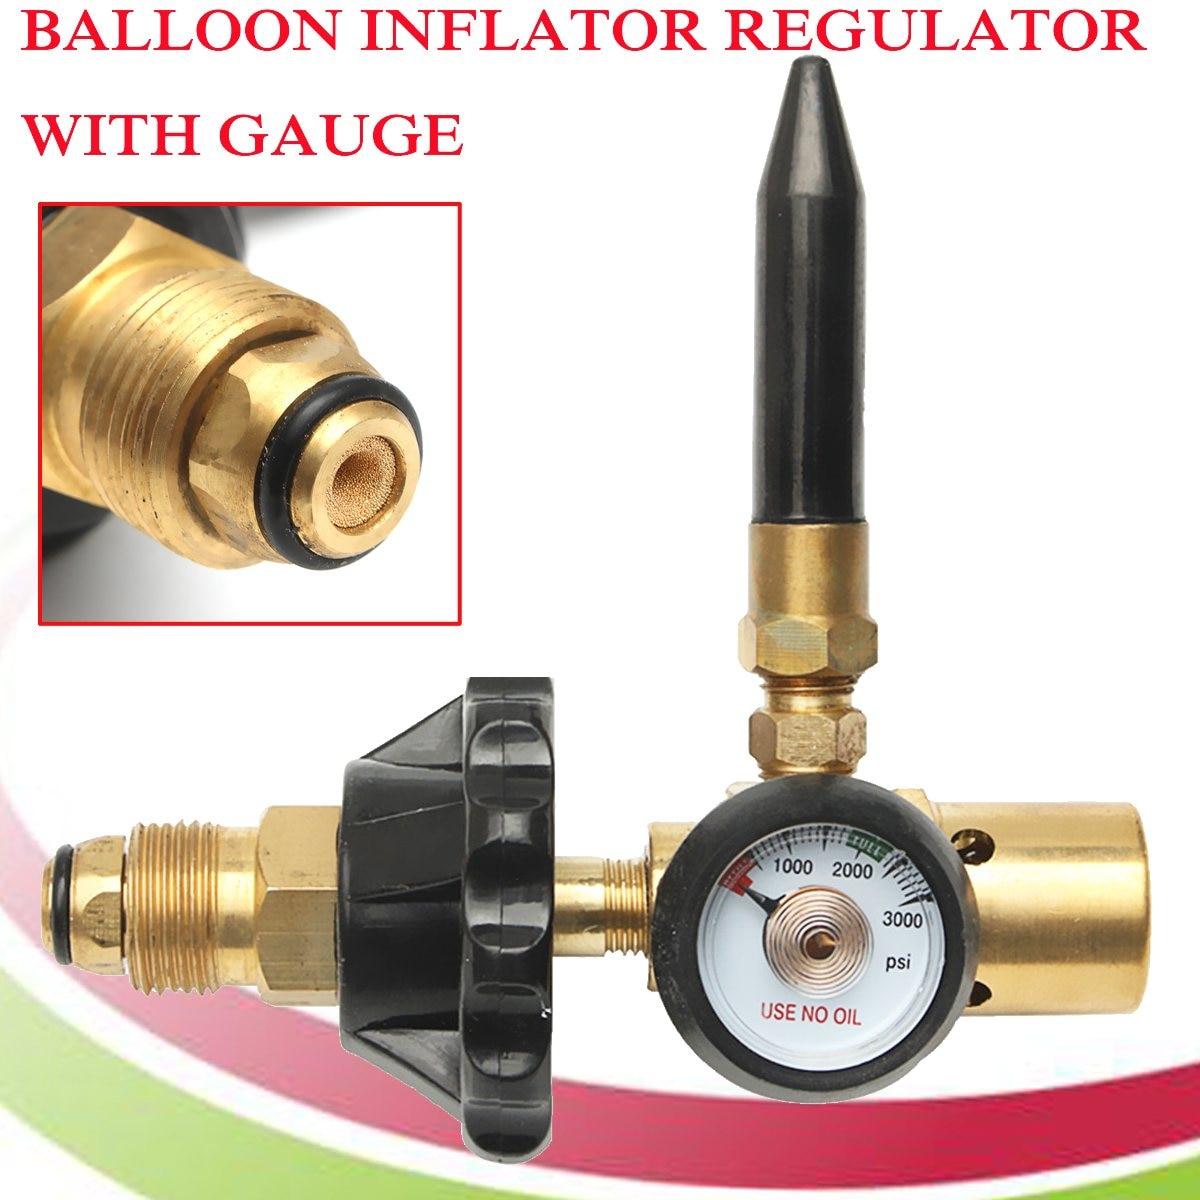 Brass Helium Latex Balloon Inflator Regulator With Pressure Gauge For G5/8 Tank Valves Mayitr 145*135mm brass rubber 0 3000psi helium tank regulator filler valve for g5 8 tank valves balloons 300 150mm